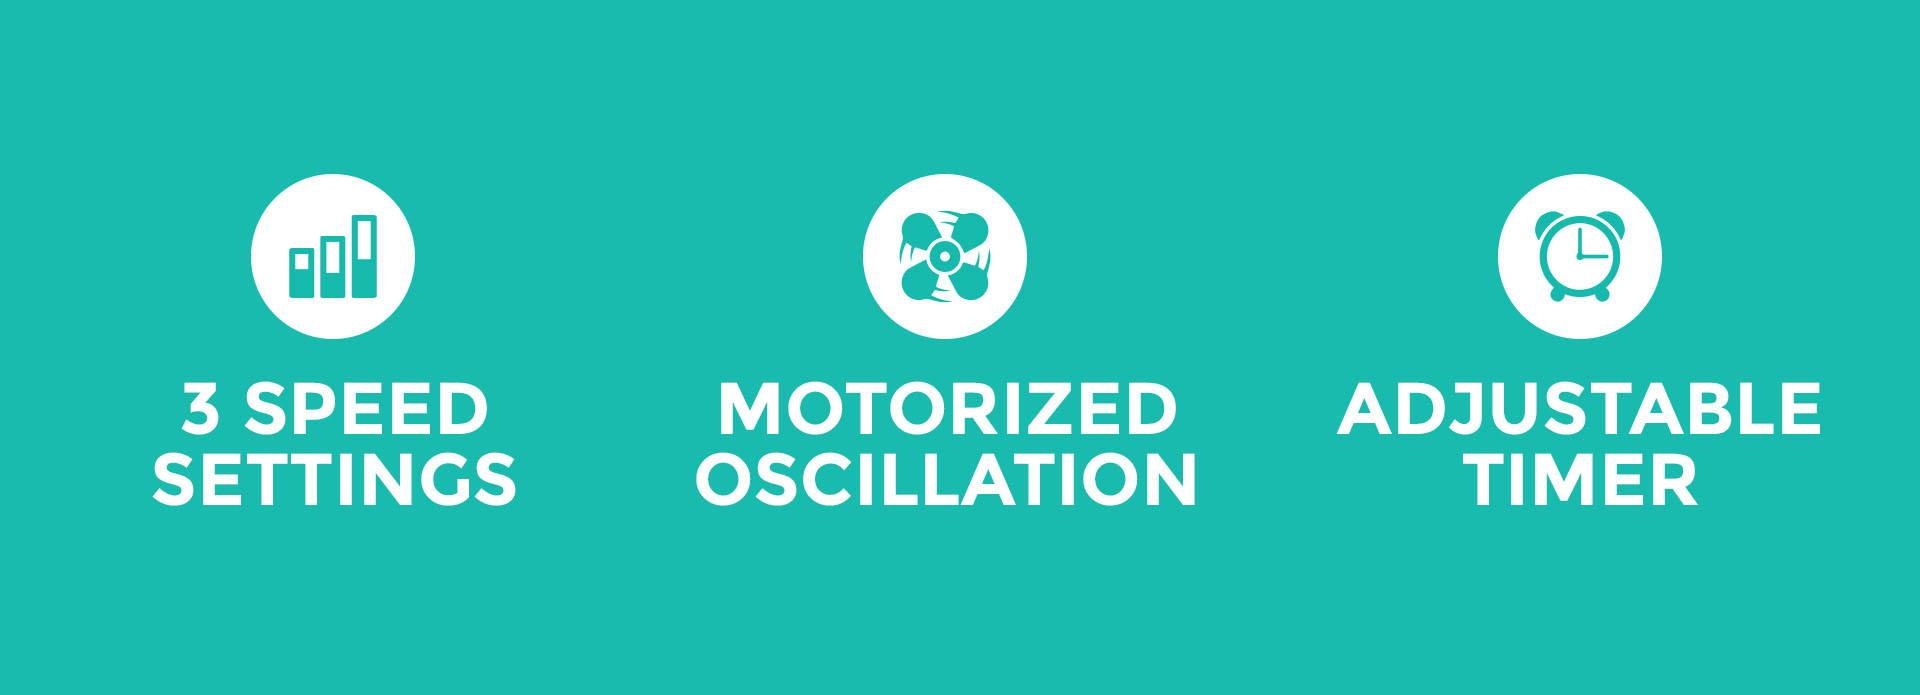 3 Speed Settings - Motorized Oscillation - Adjustable Timer